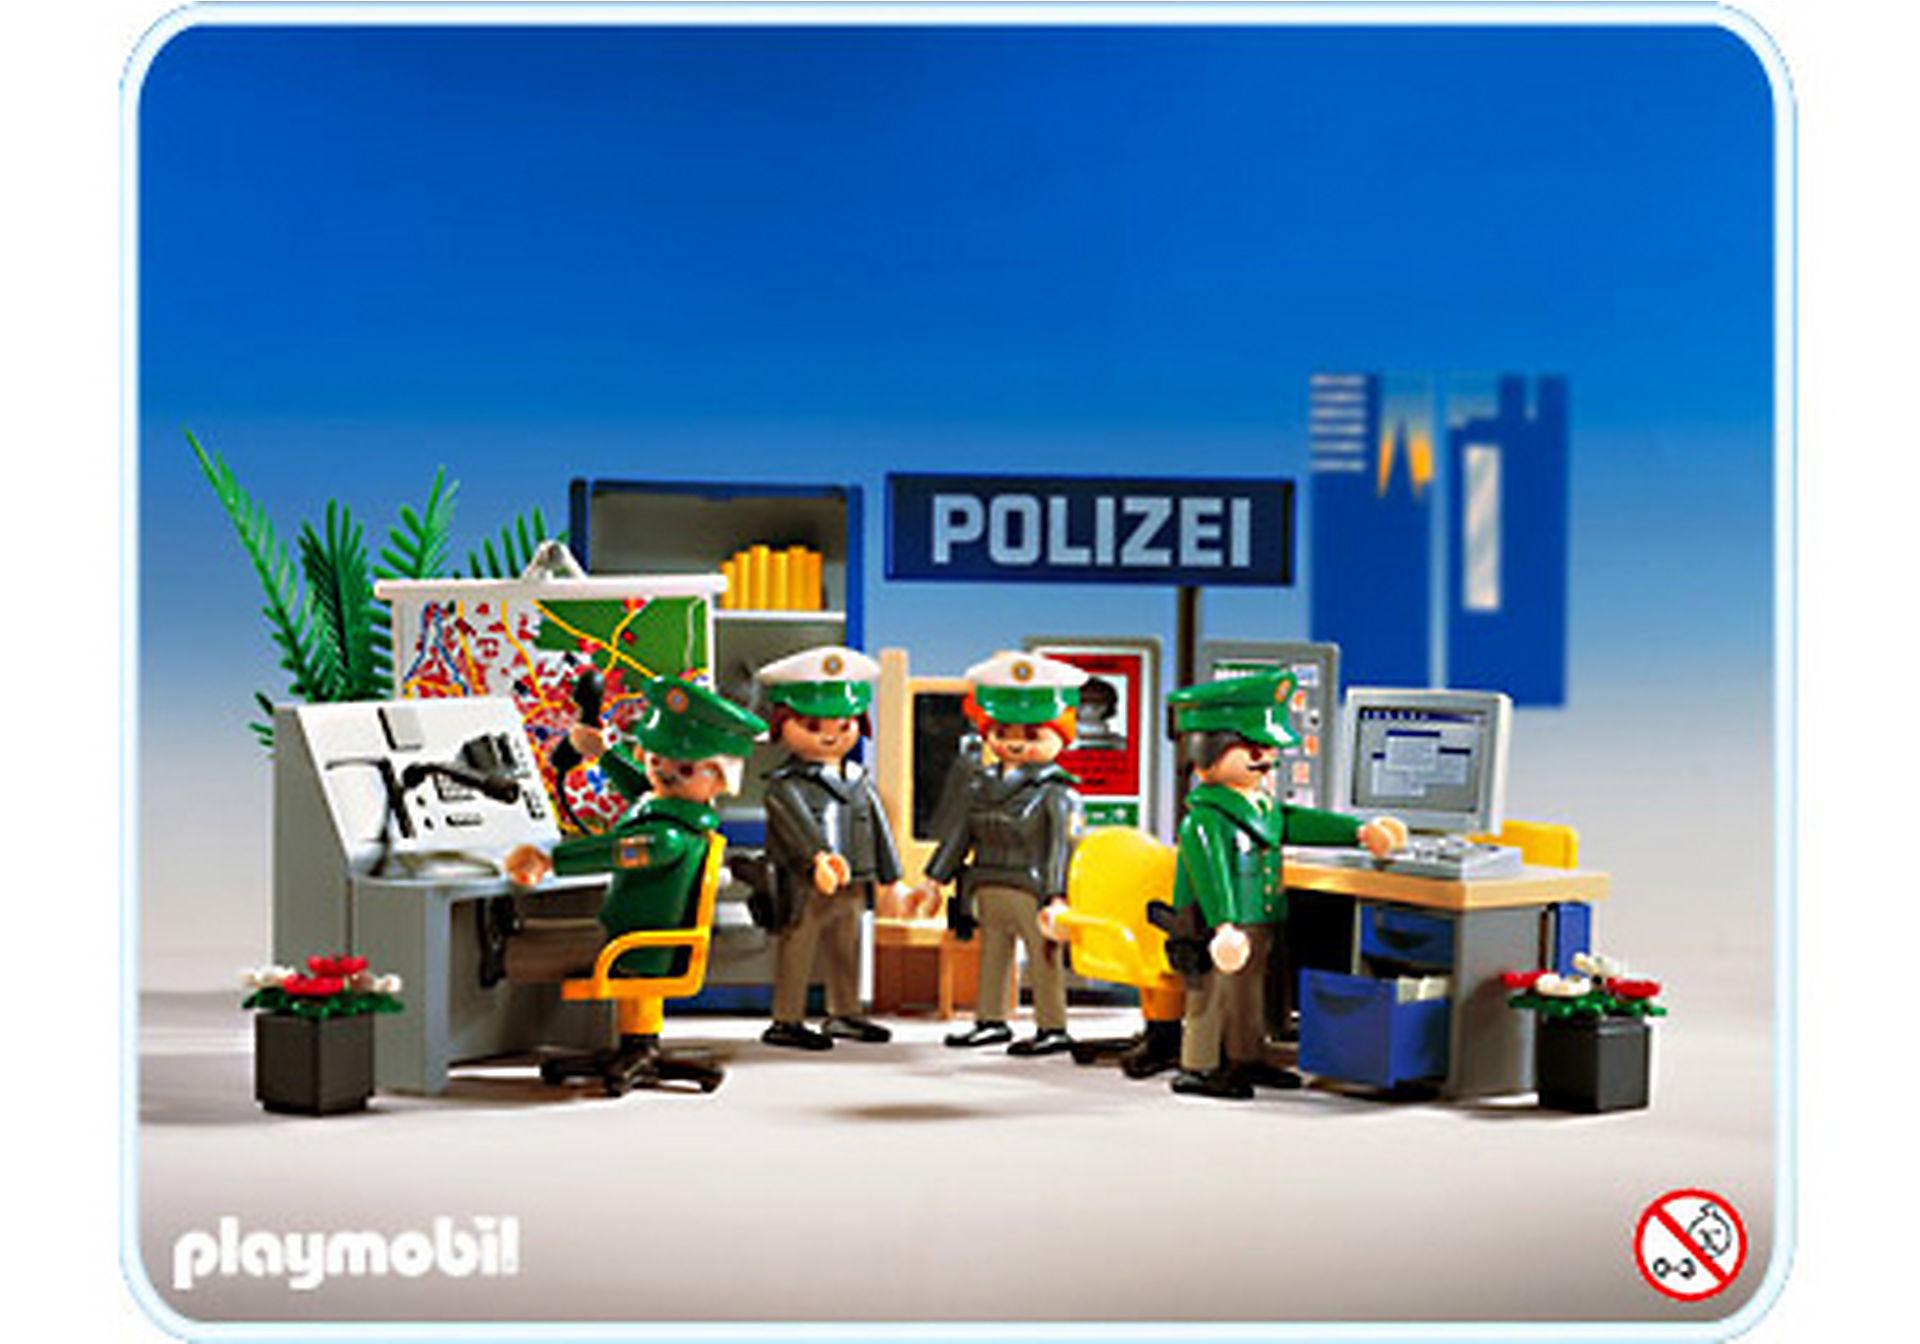 3954-A Polizeizentrale zoom image1